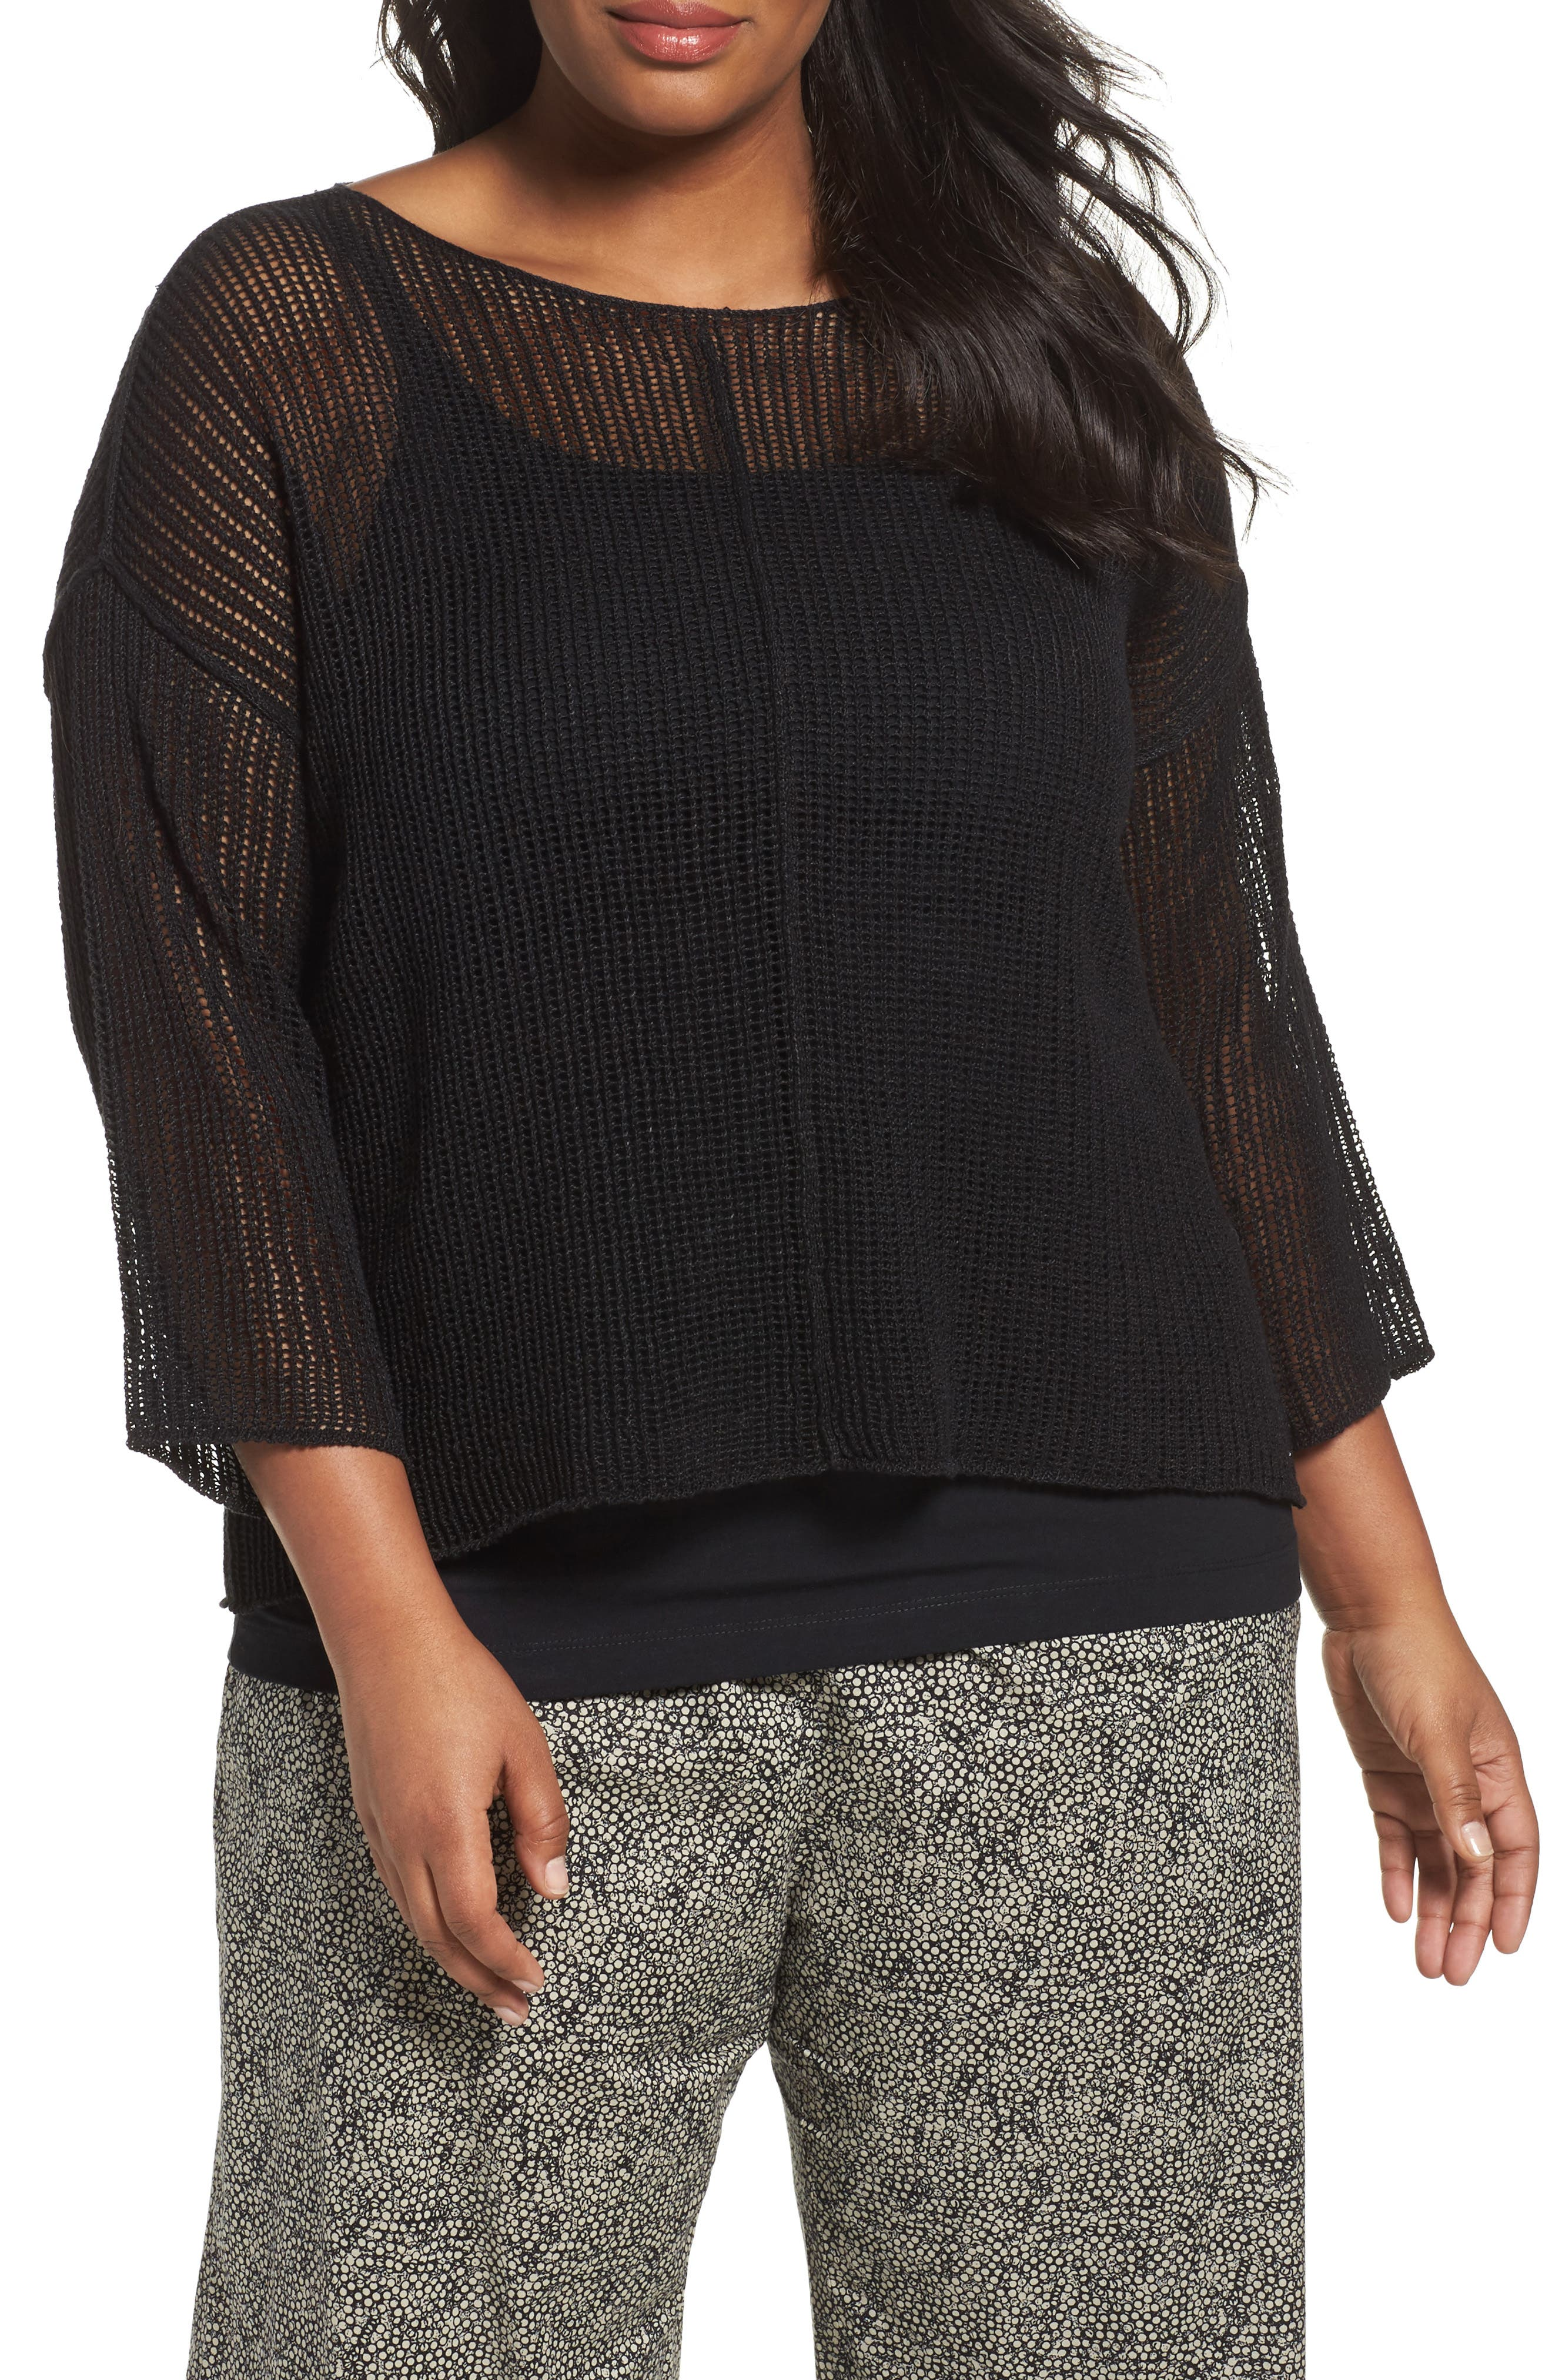 Organic Linen Mesh Knit Top,                         Main,                         color, 001